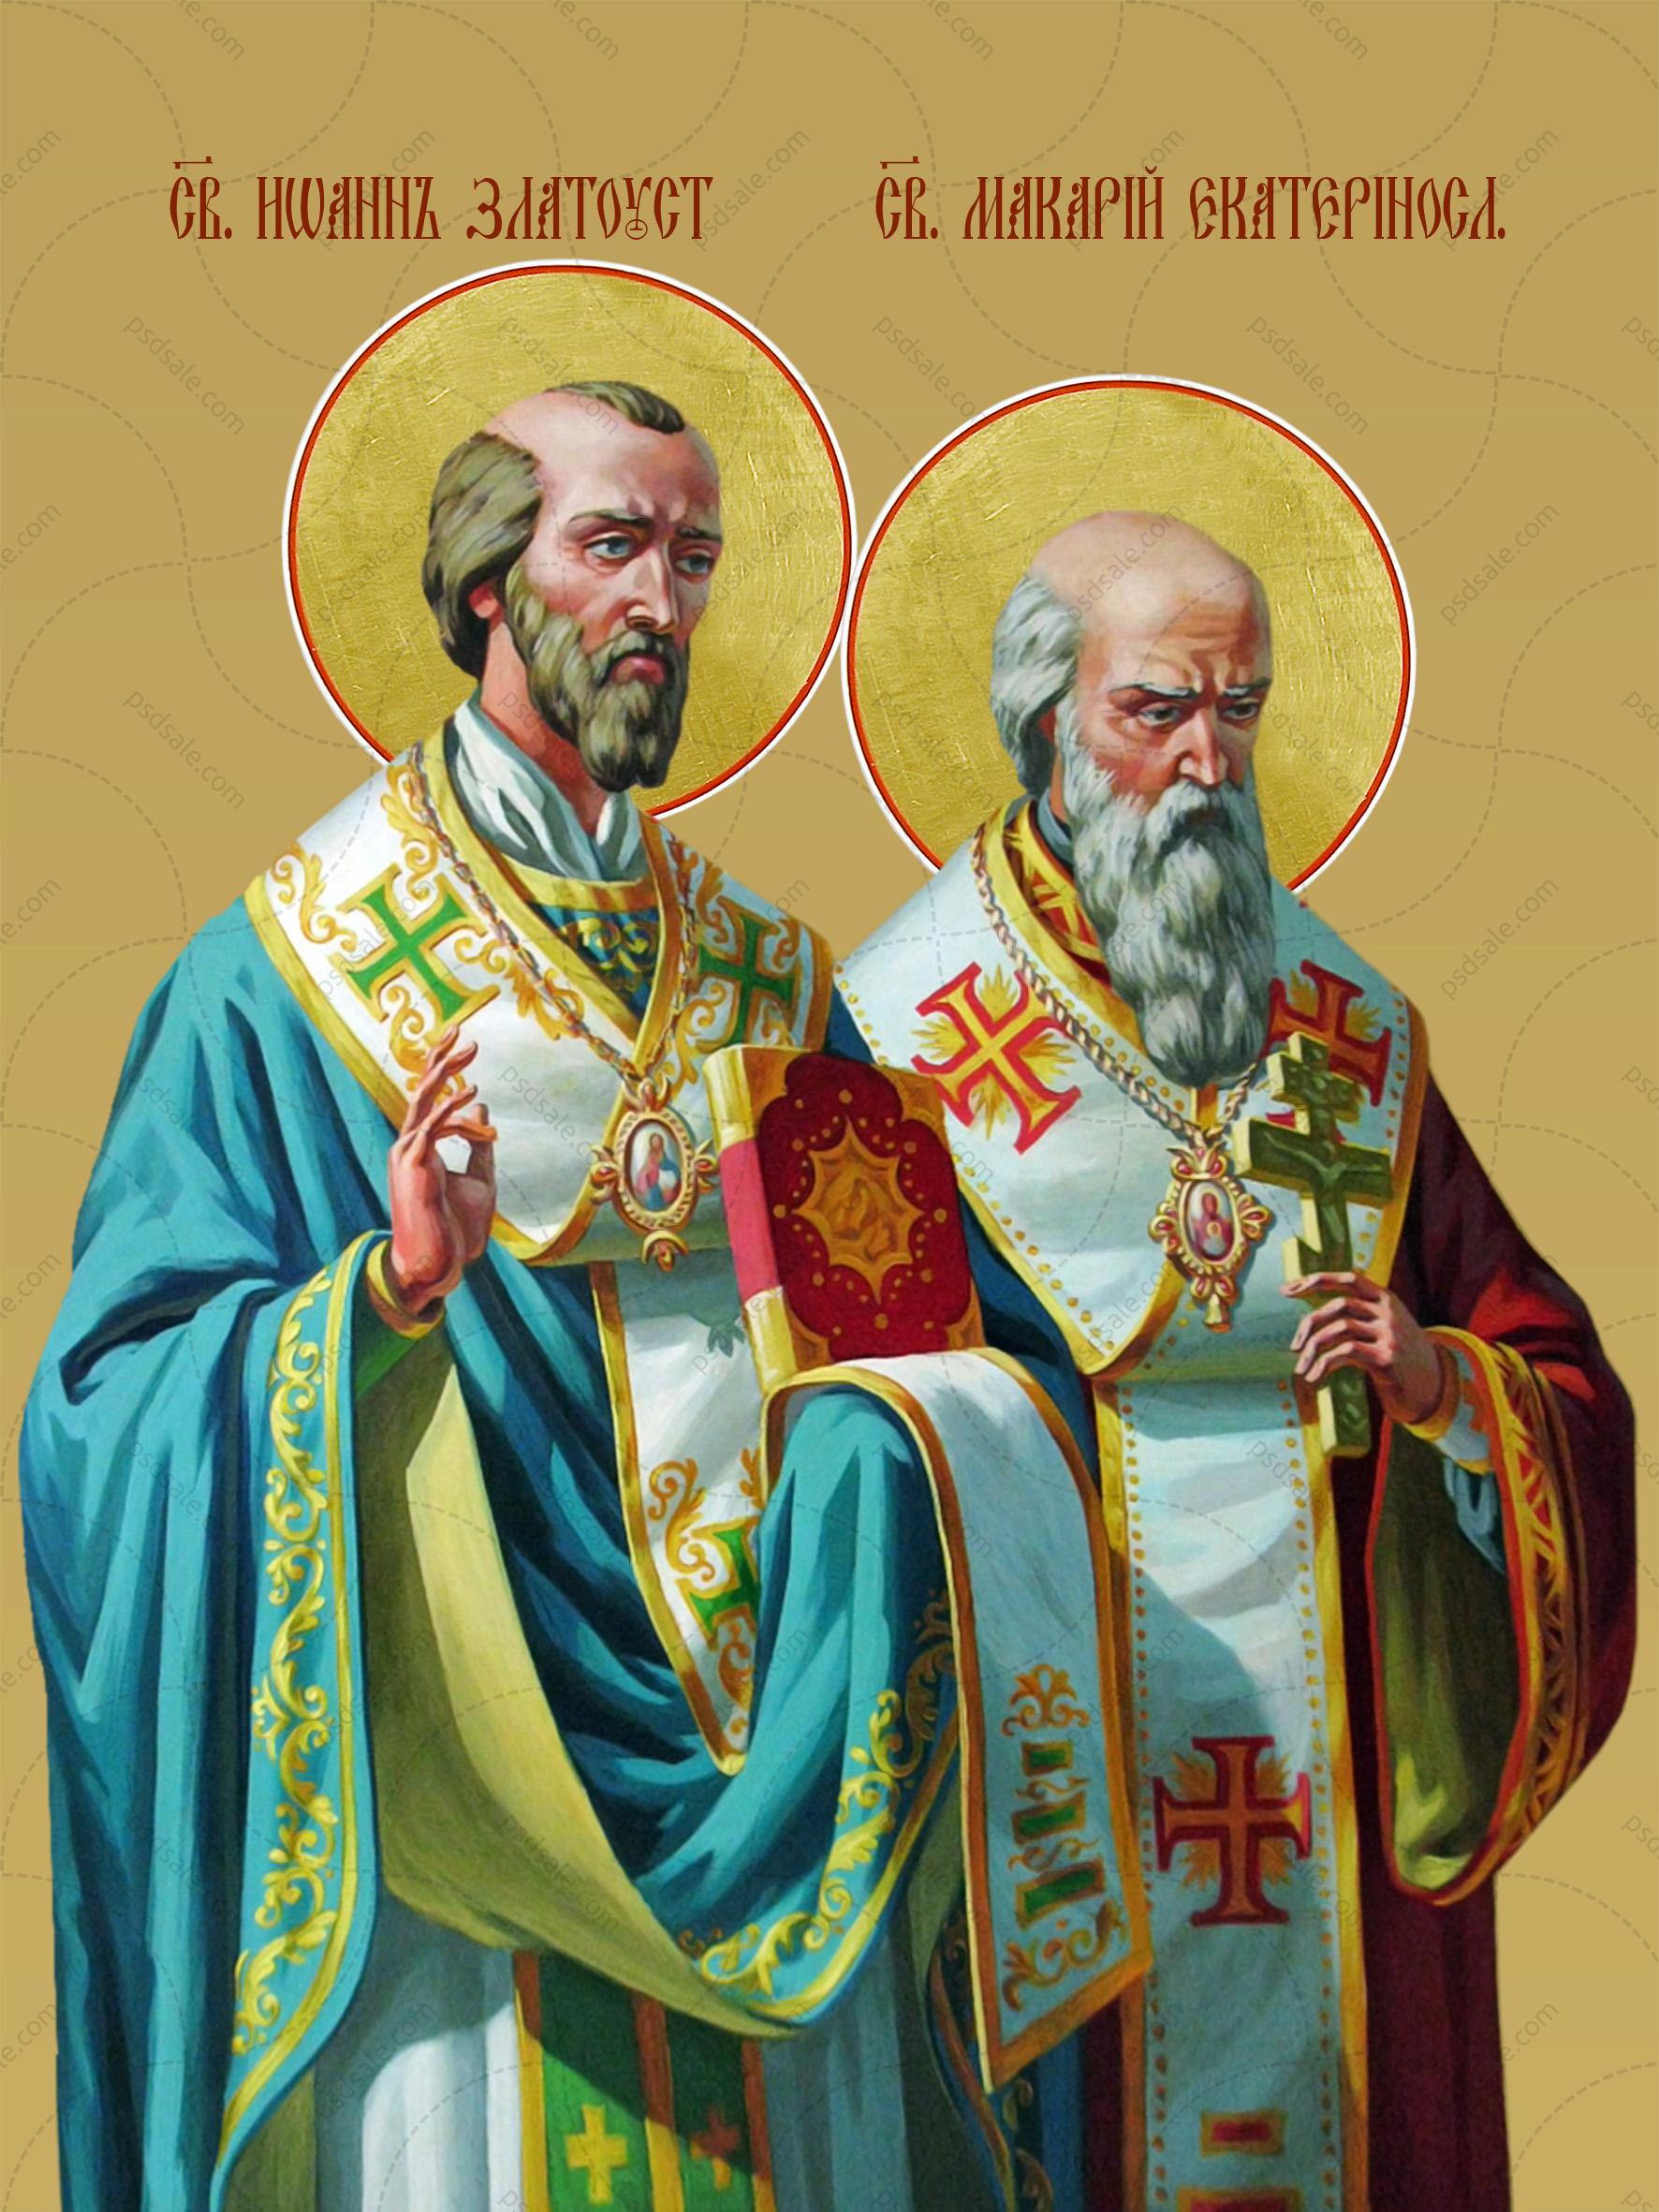 Иоанн Златоуст и Макарий